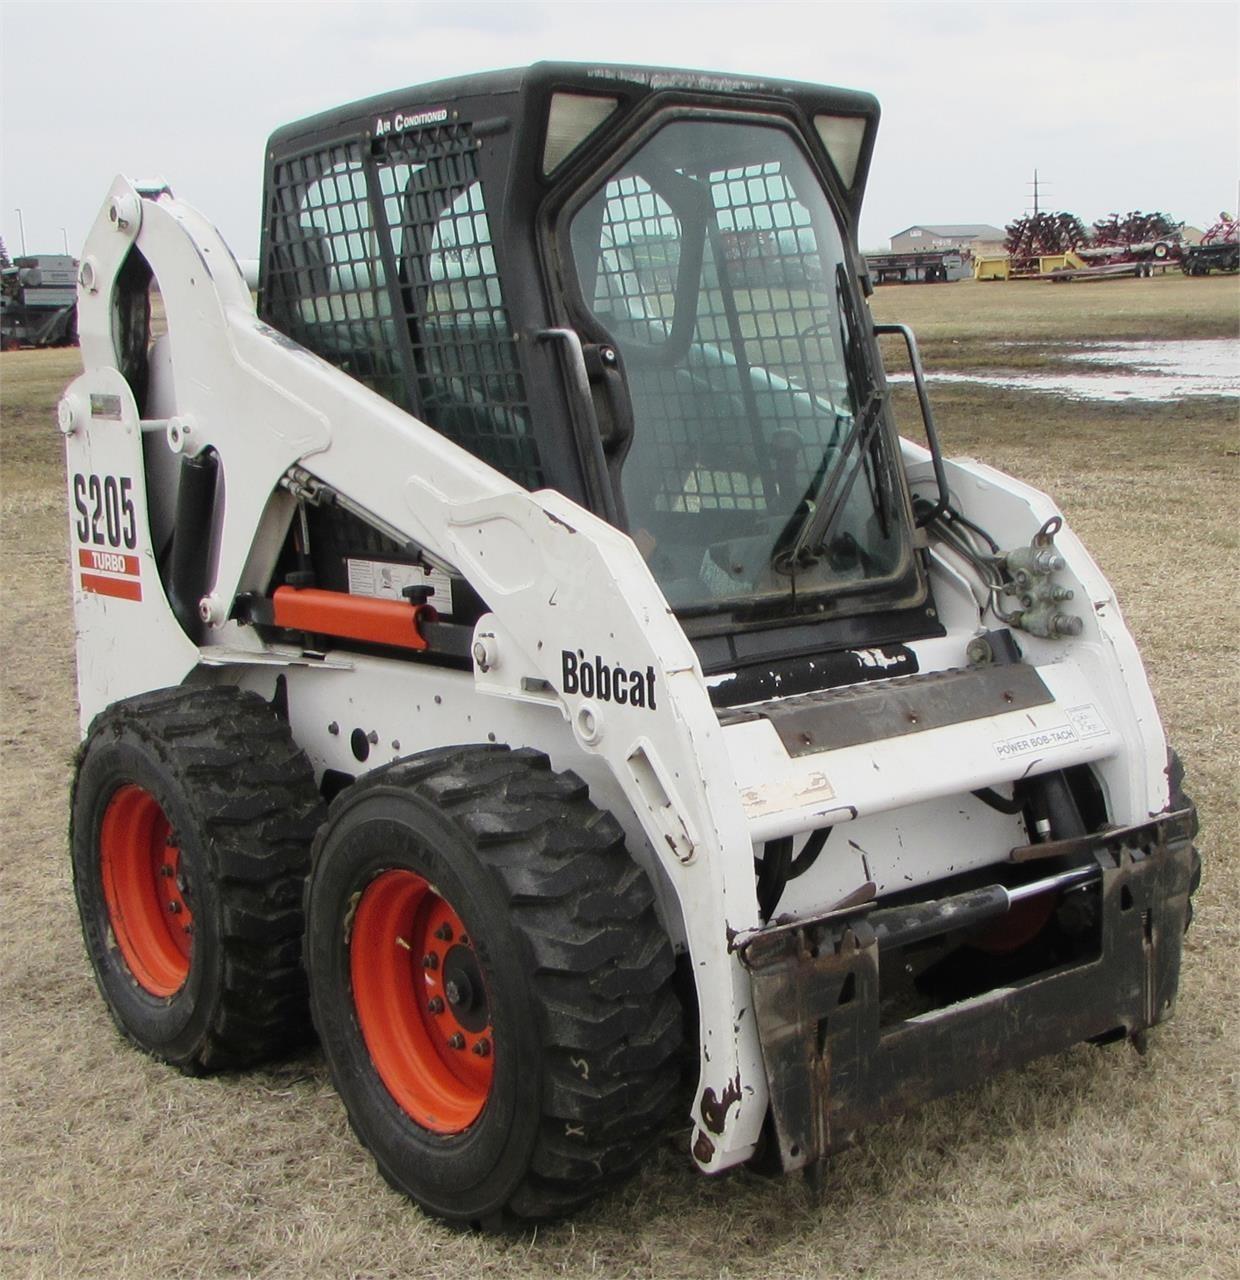 2005 Bobcat S205 Skid Steer